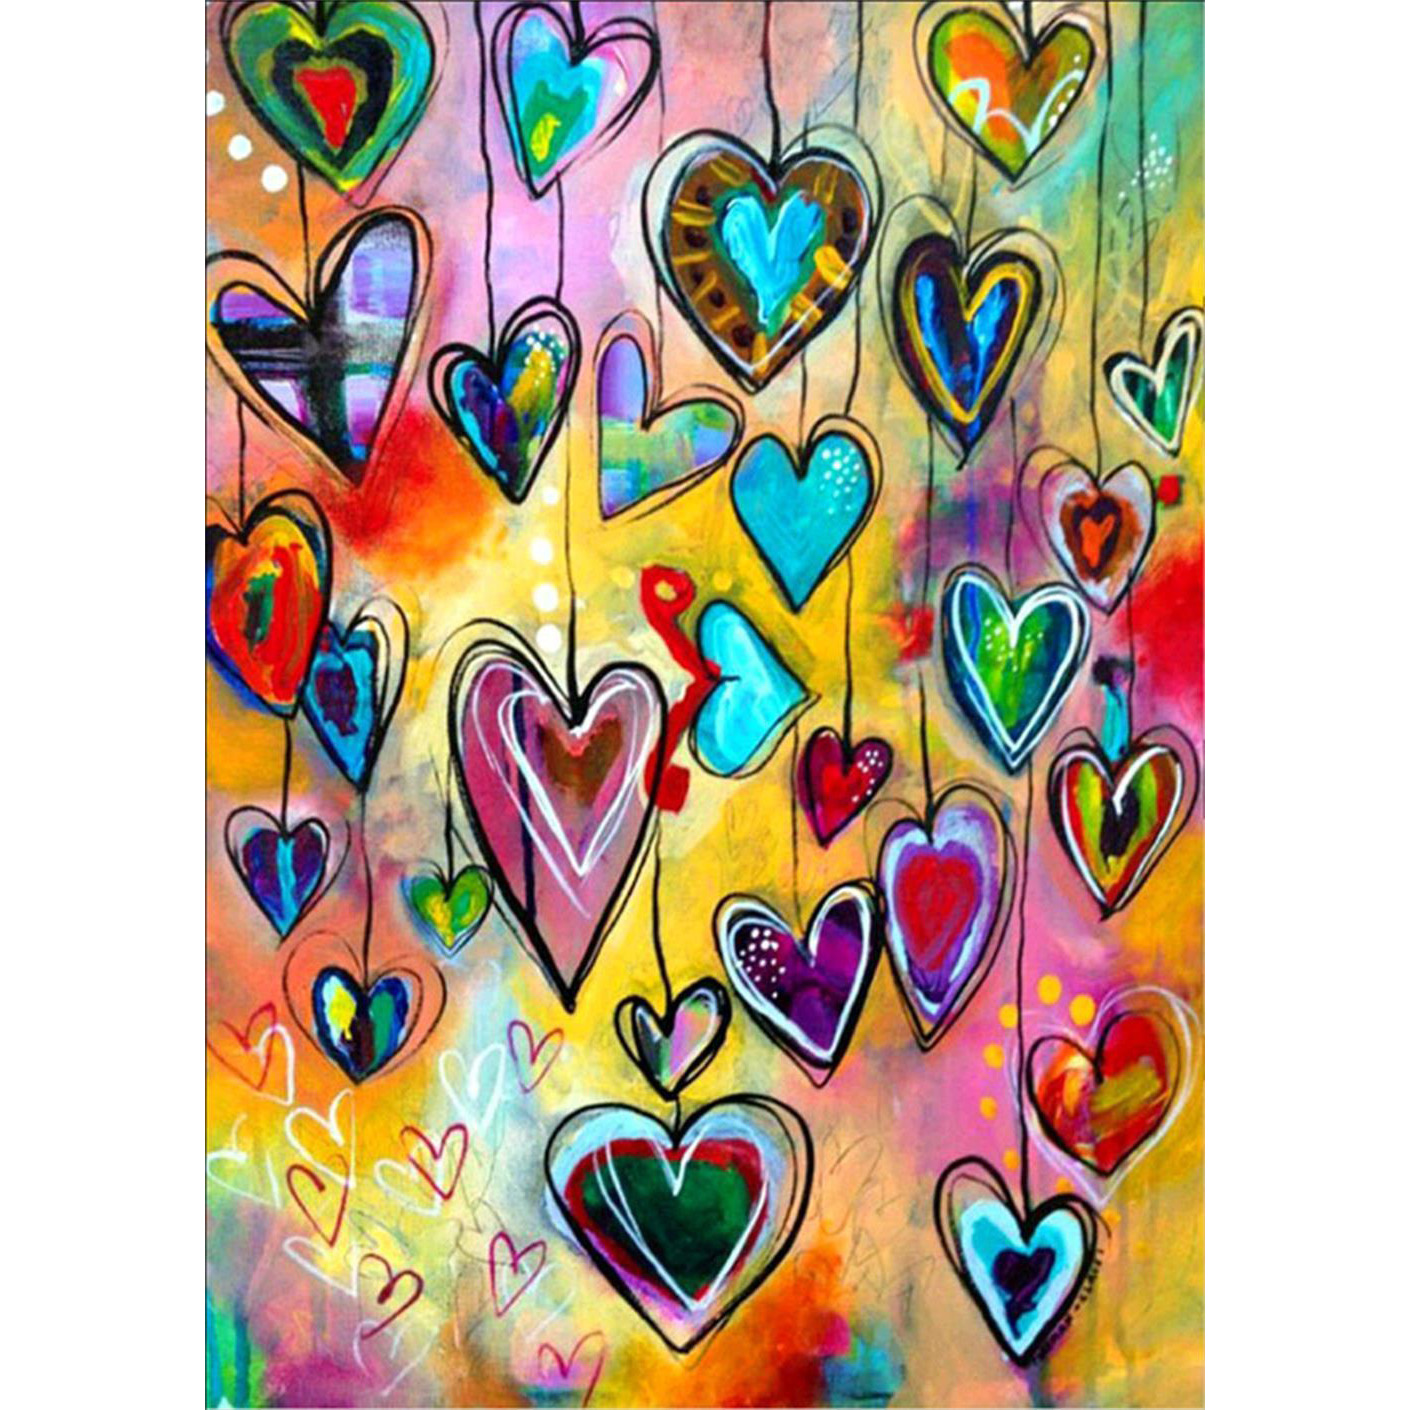 5D Diy יהלומי ציור רקמת תפר צלב צבעוני לב רקמה מלאכה-בבד לציור מתוך ציוד למשרד ולבית הספר באתר